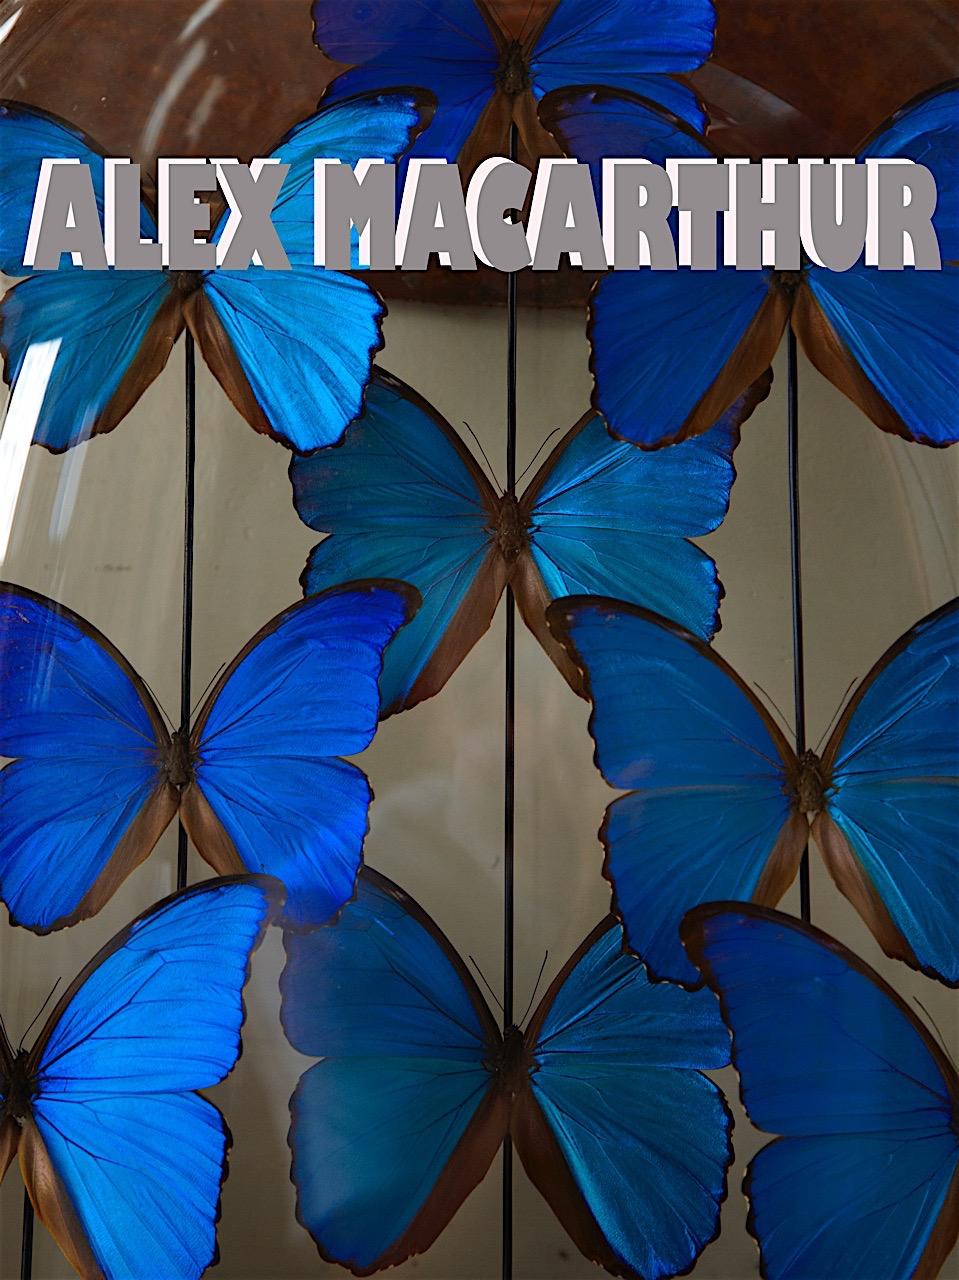 Alex MacCarthur